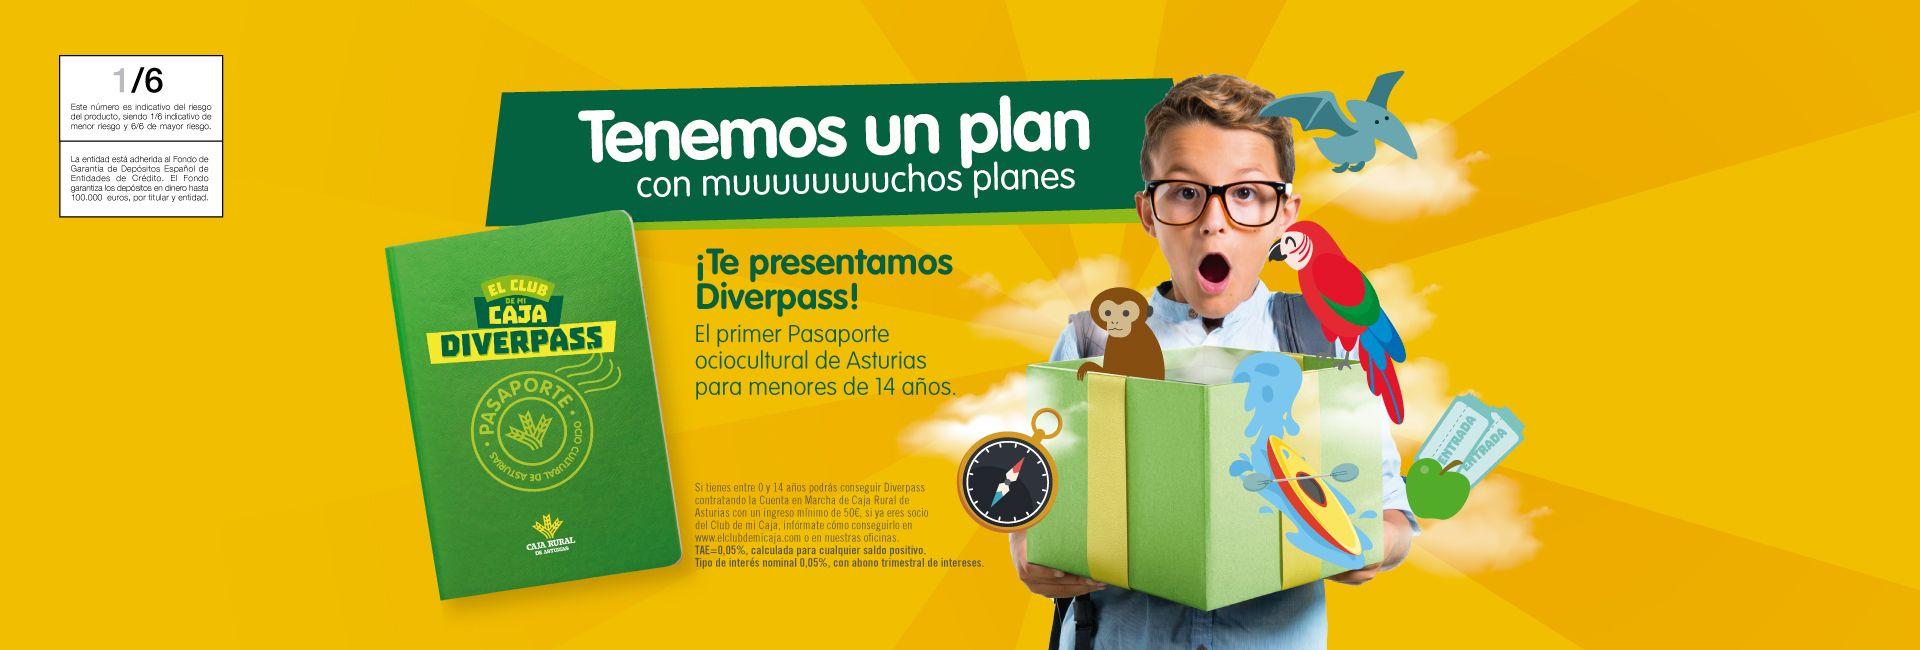 http://elclubdemicaja.es/resources/sections/banner-caja-rural-pasaporte-v5.jpg